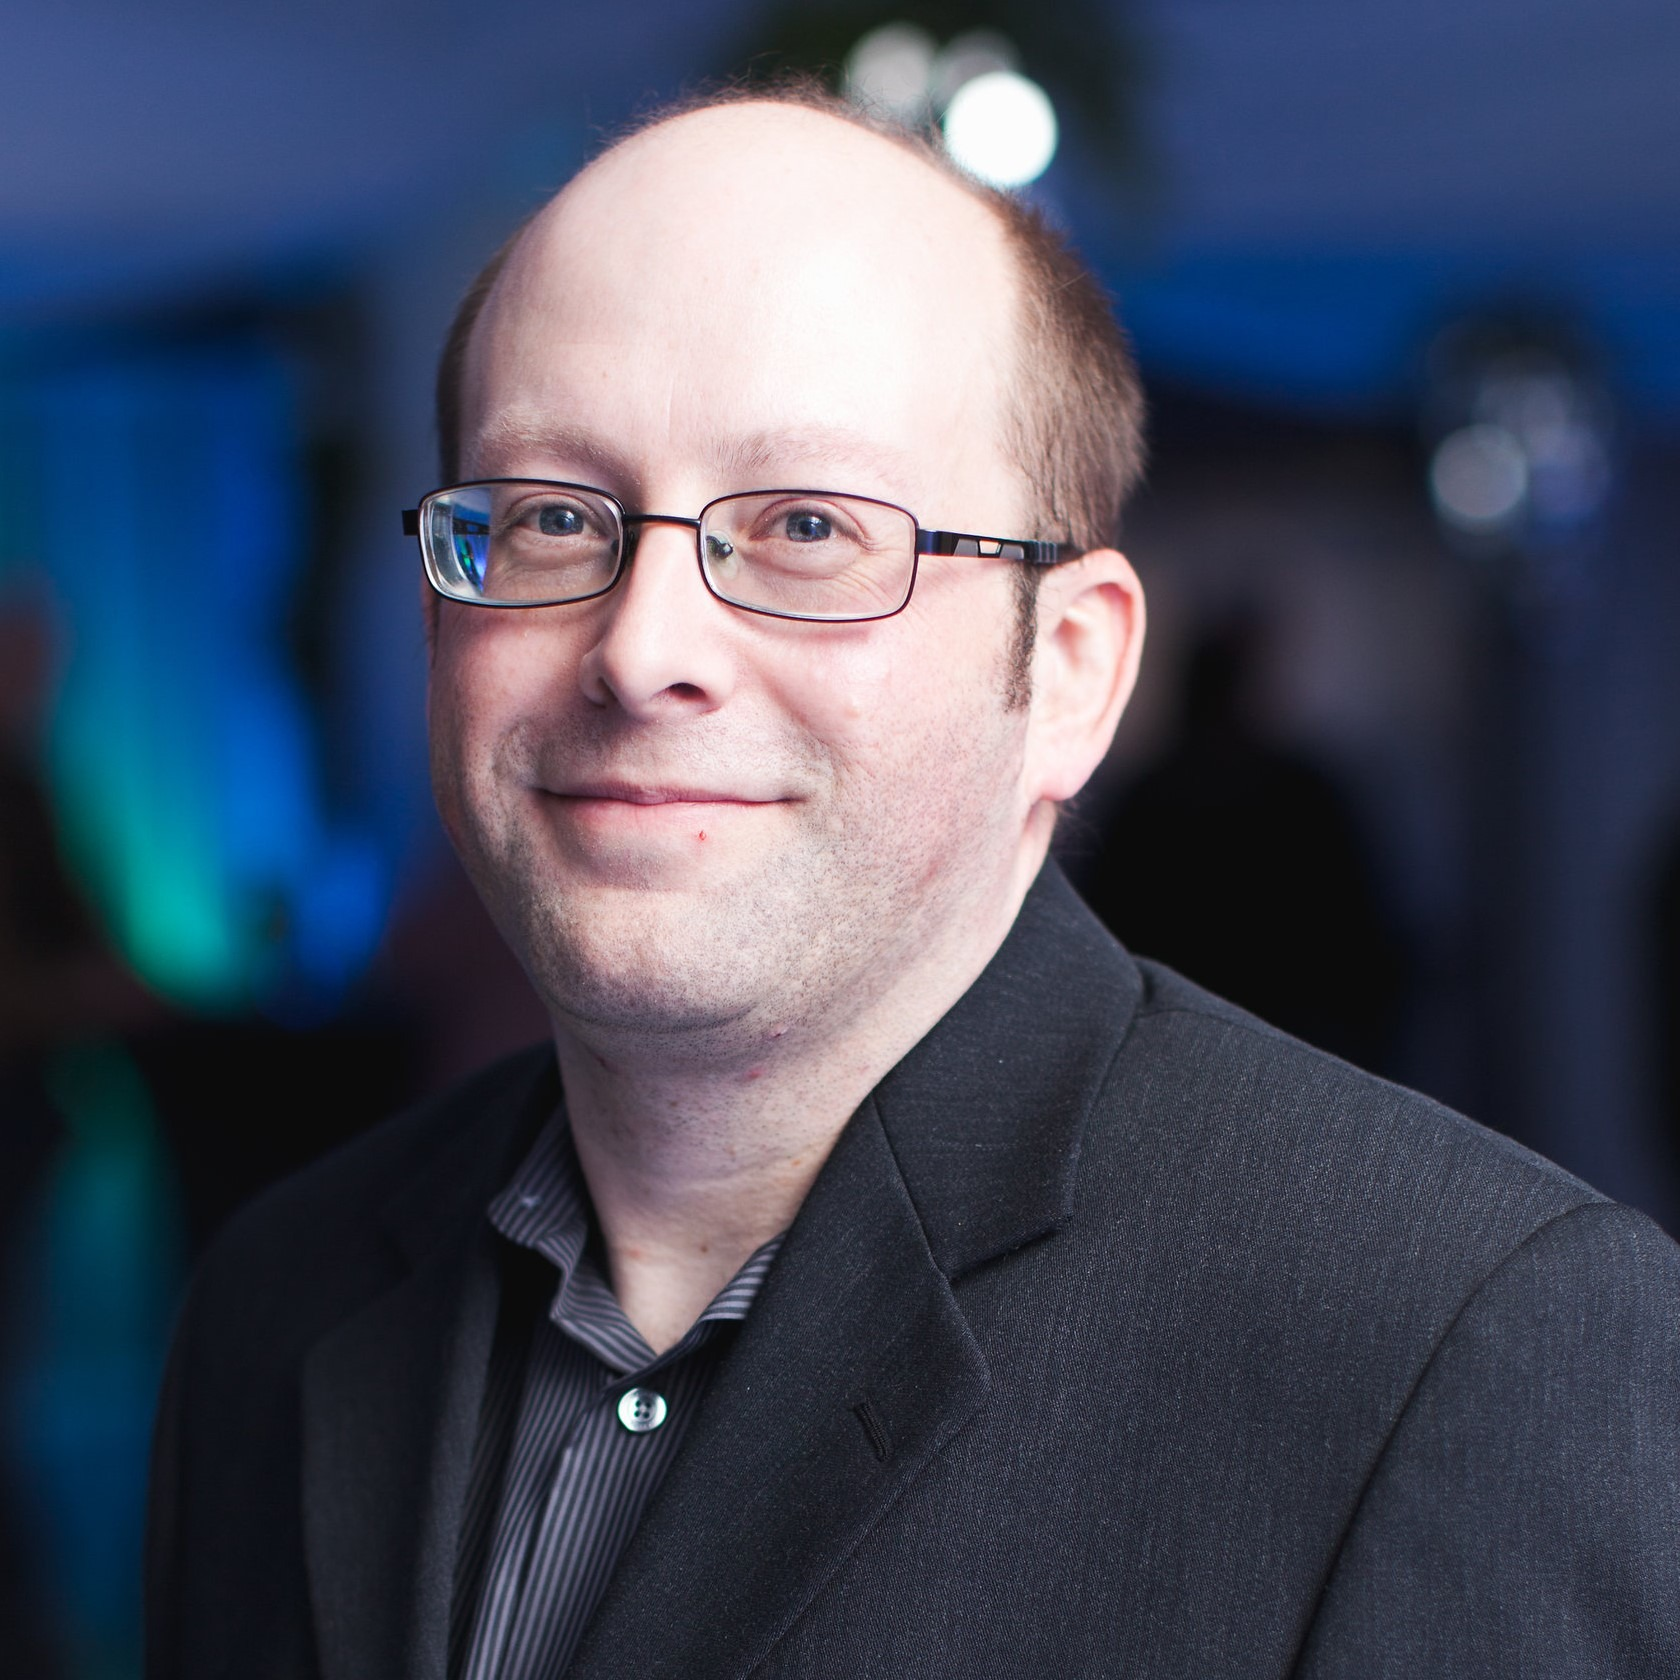 Staff photo of Scott Samson